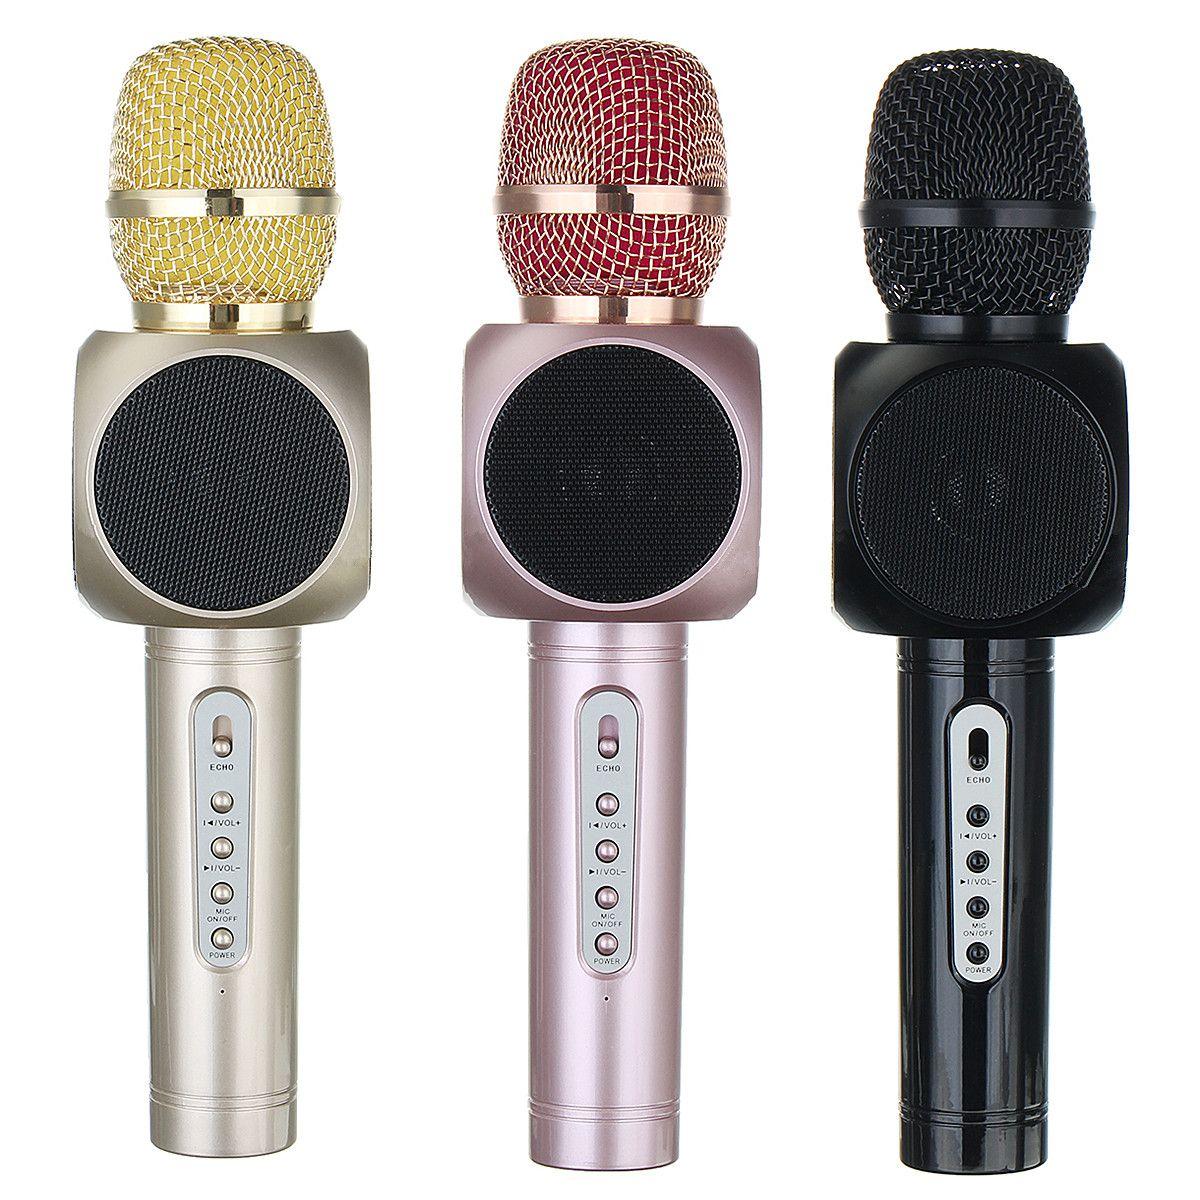 E103 handheld ktv karaoke wireless microphone bluetooth